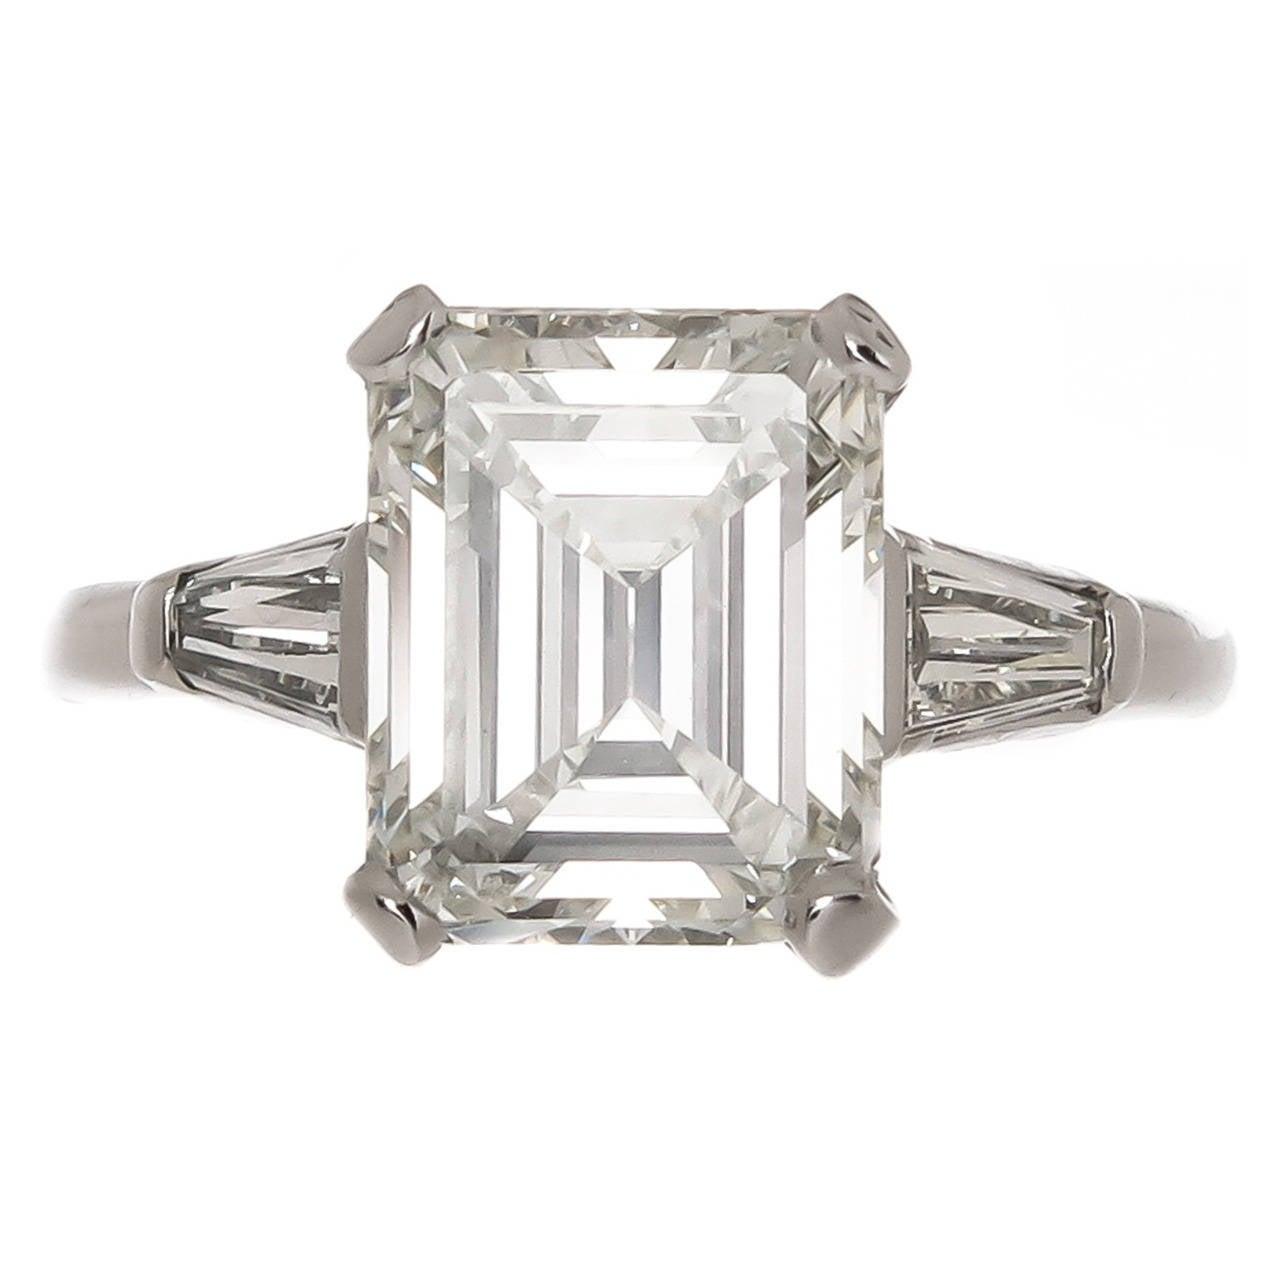 Fine 3 48 Carat Emerald Cut Diamond Platinum Ring at 1stdibs